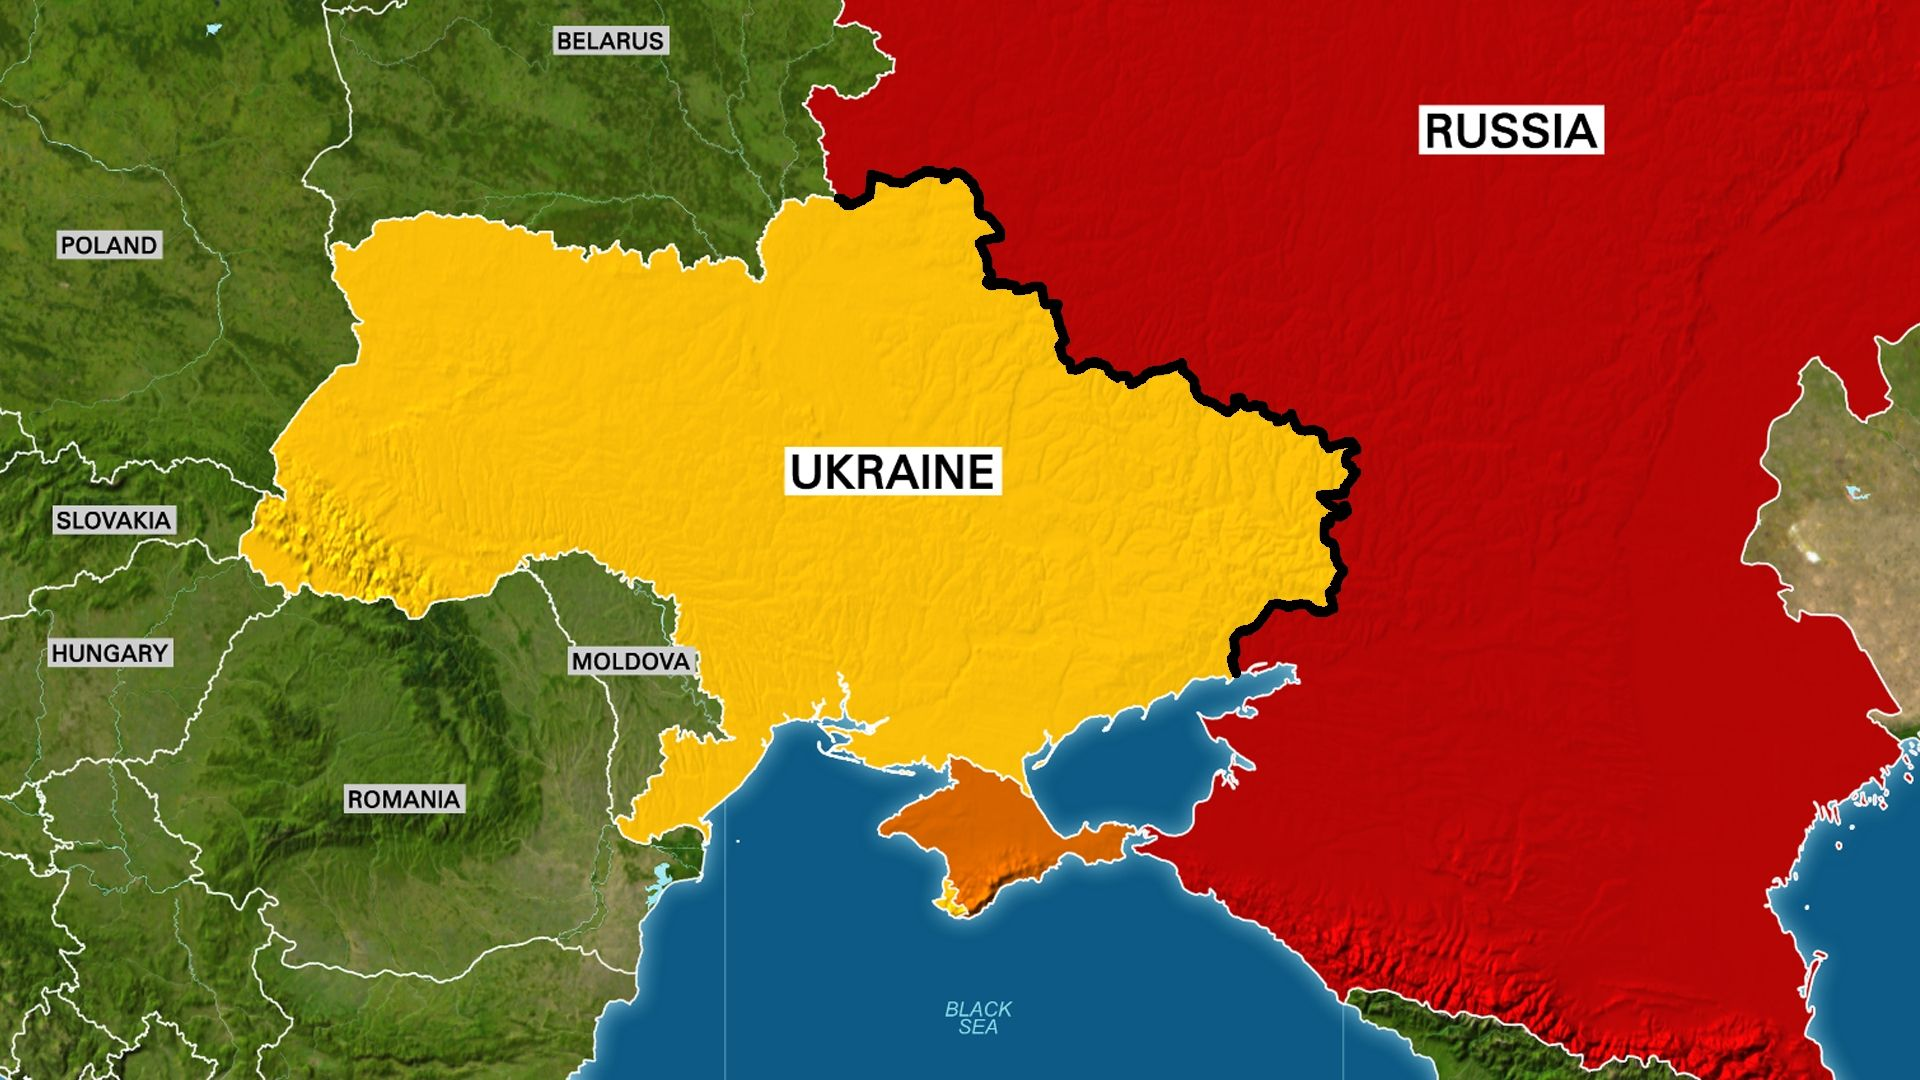 Ukrayna hakkında - Ukrayna Hayat | Ukrayna'dan HaberlerUkrayna Hayat | Ukrayna'dan Haberler